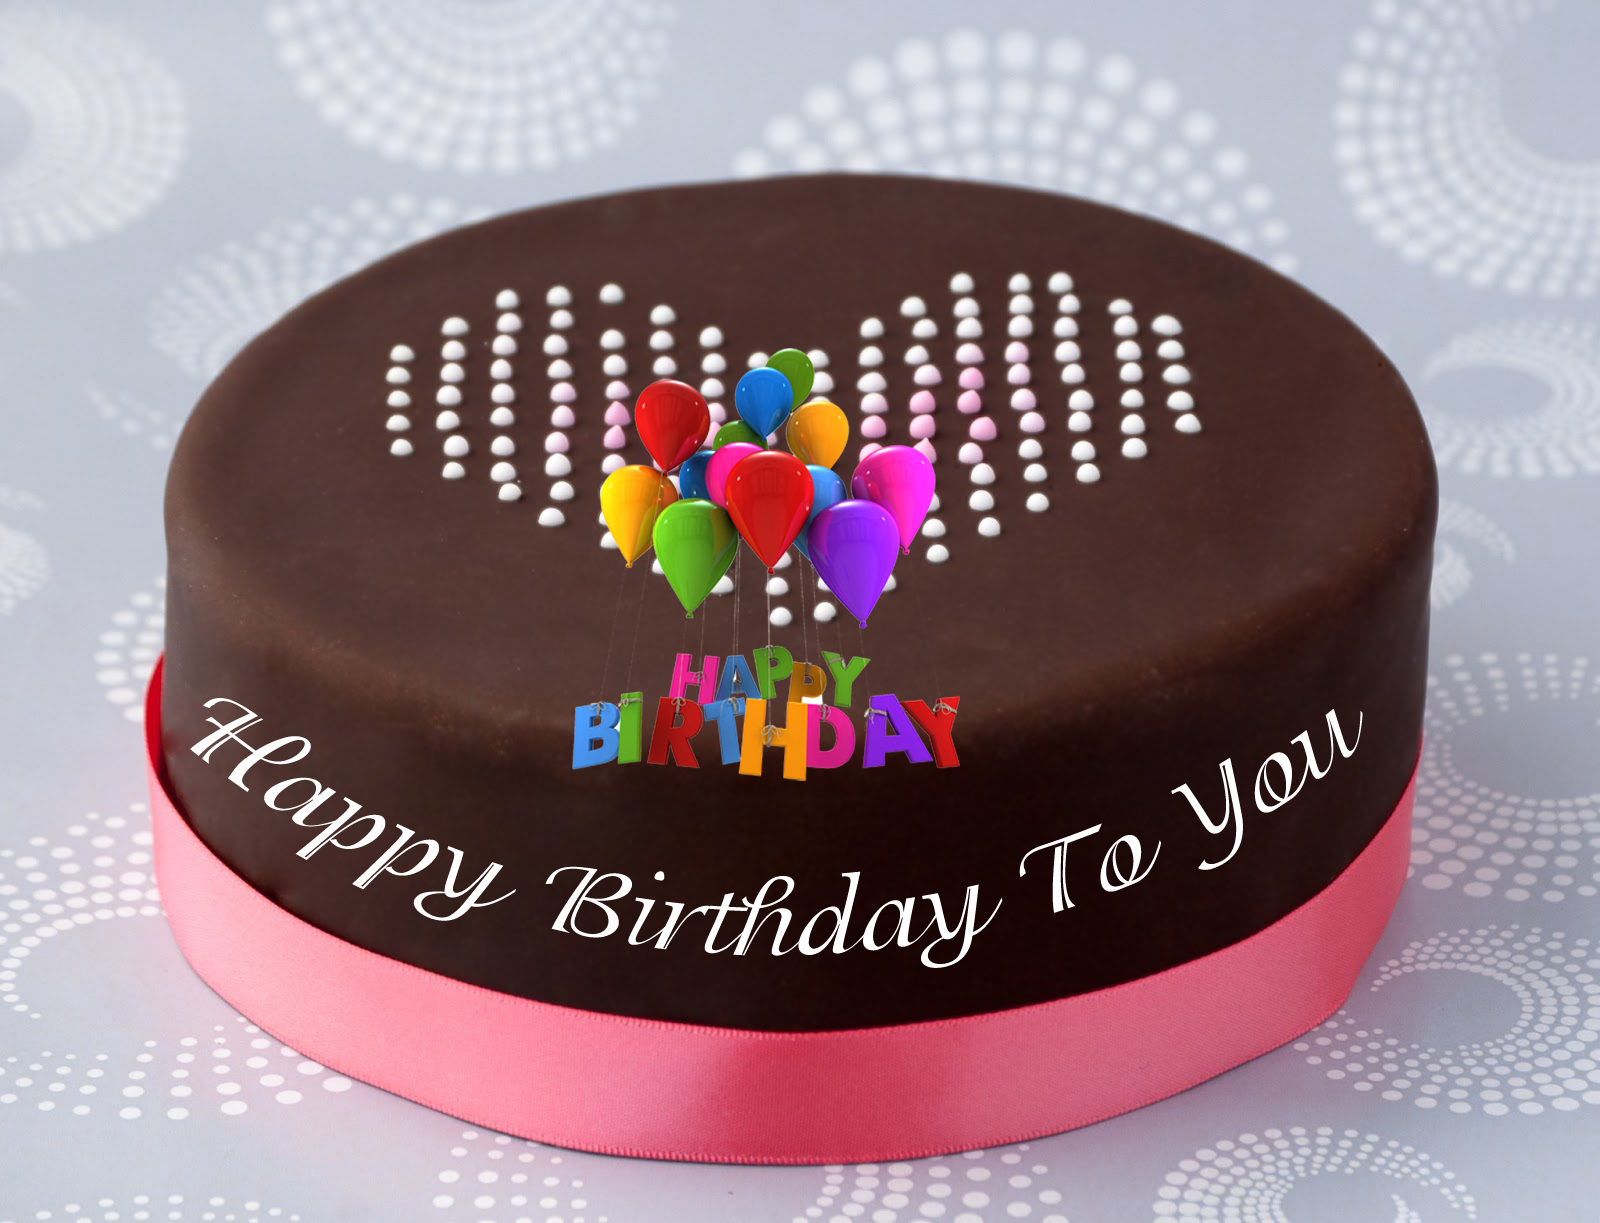 Selamat ulang tahun istriku tercinta semoga selalu diberikan